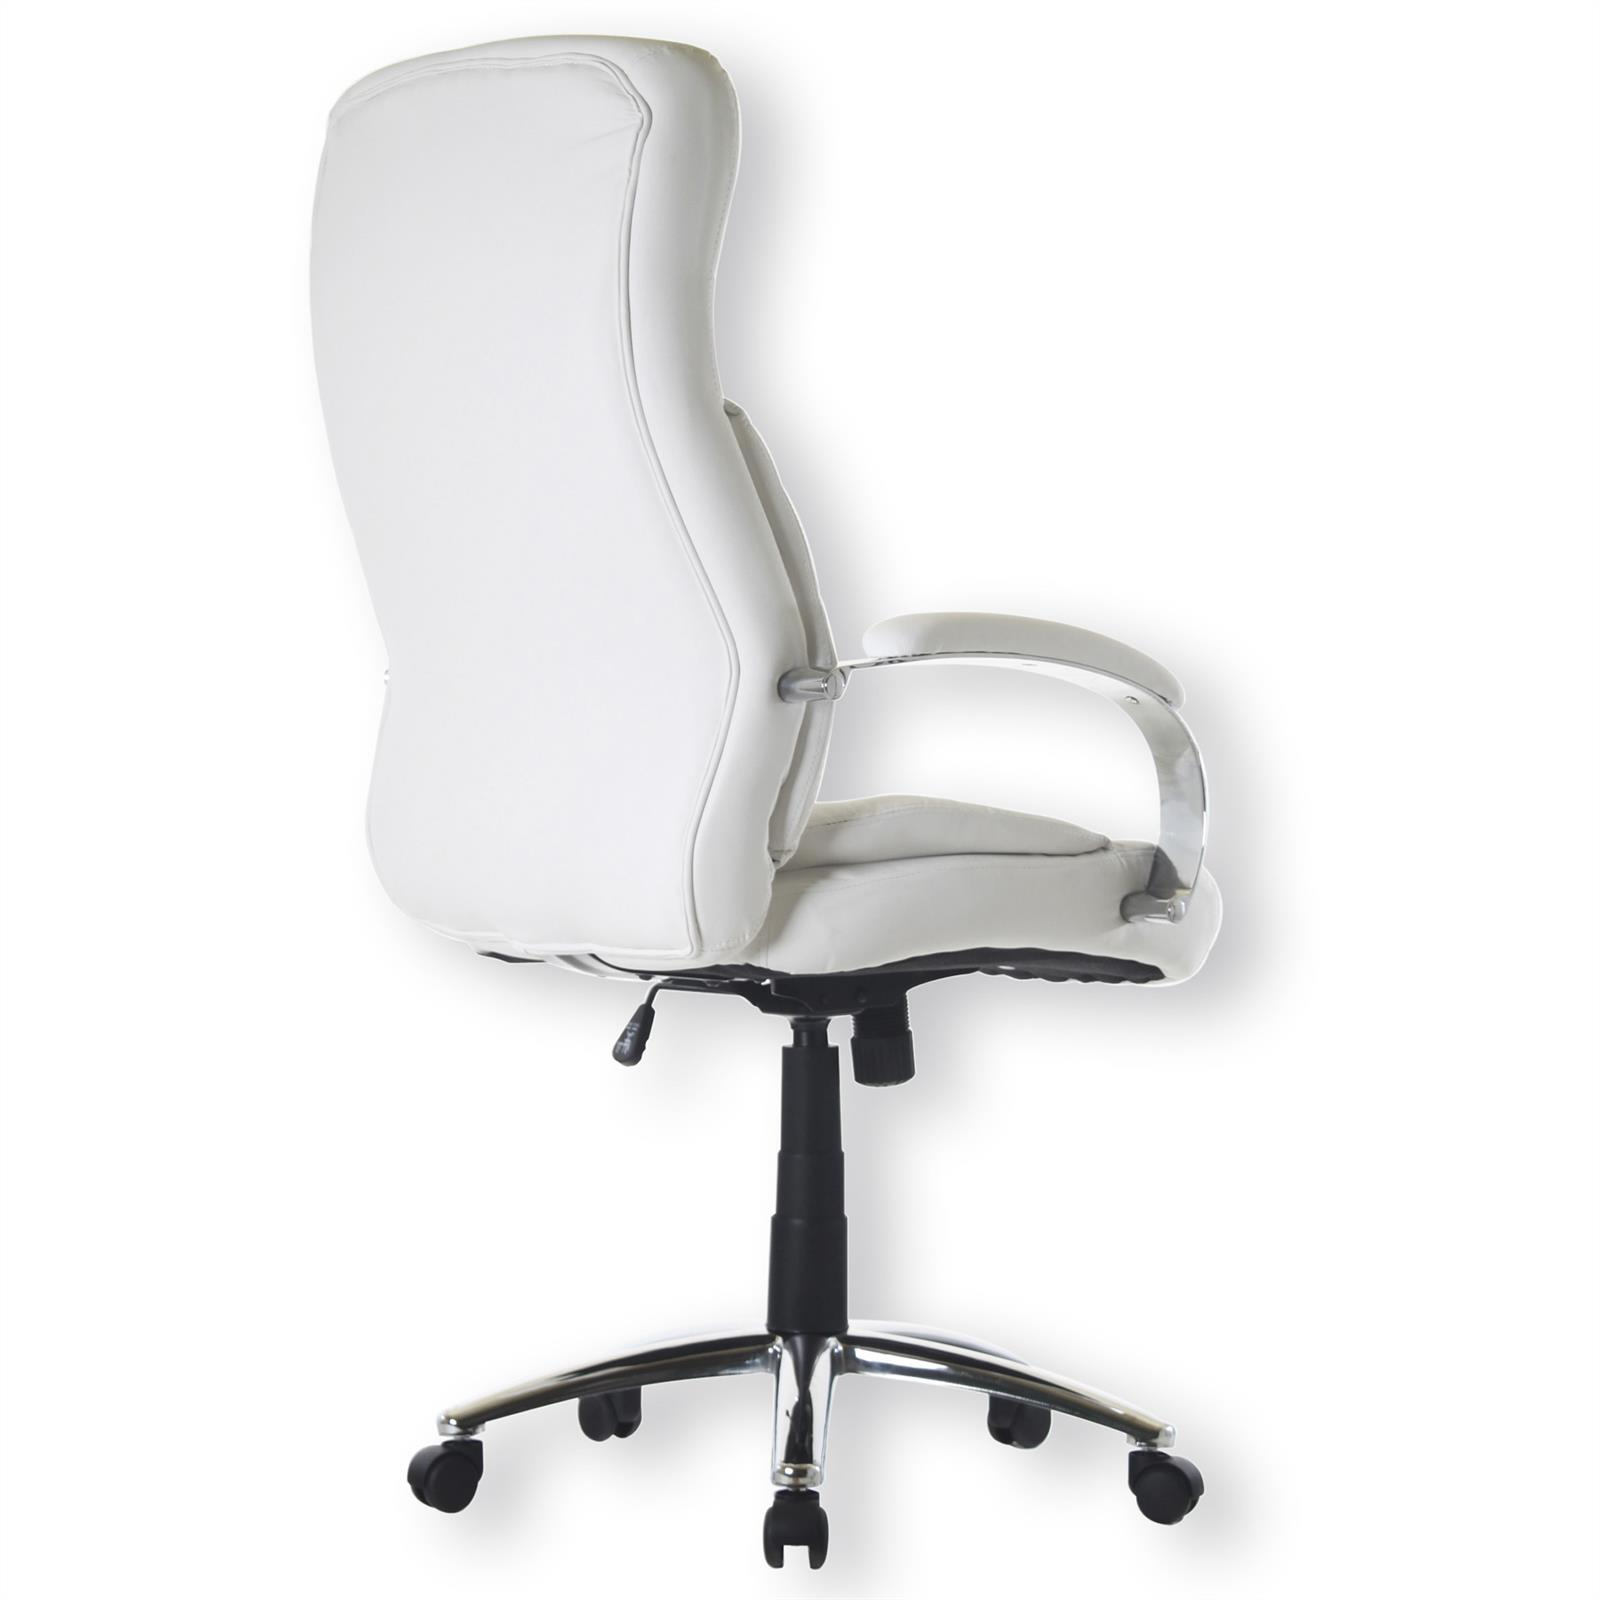 fauteuil de bureau consul 2 avec accoudoirs blanc. Black Bedroom Furniture Sets. Home Design Ideas